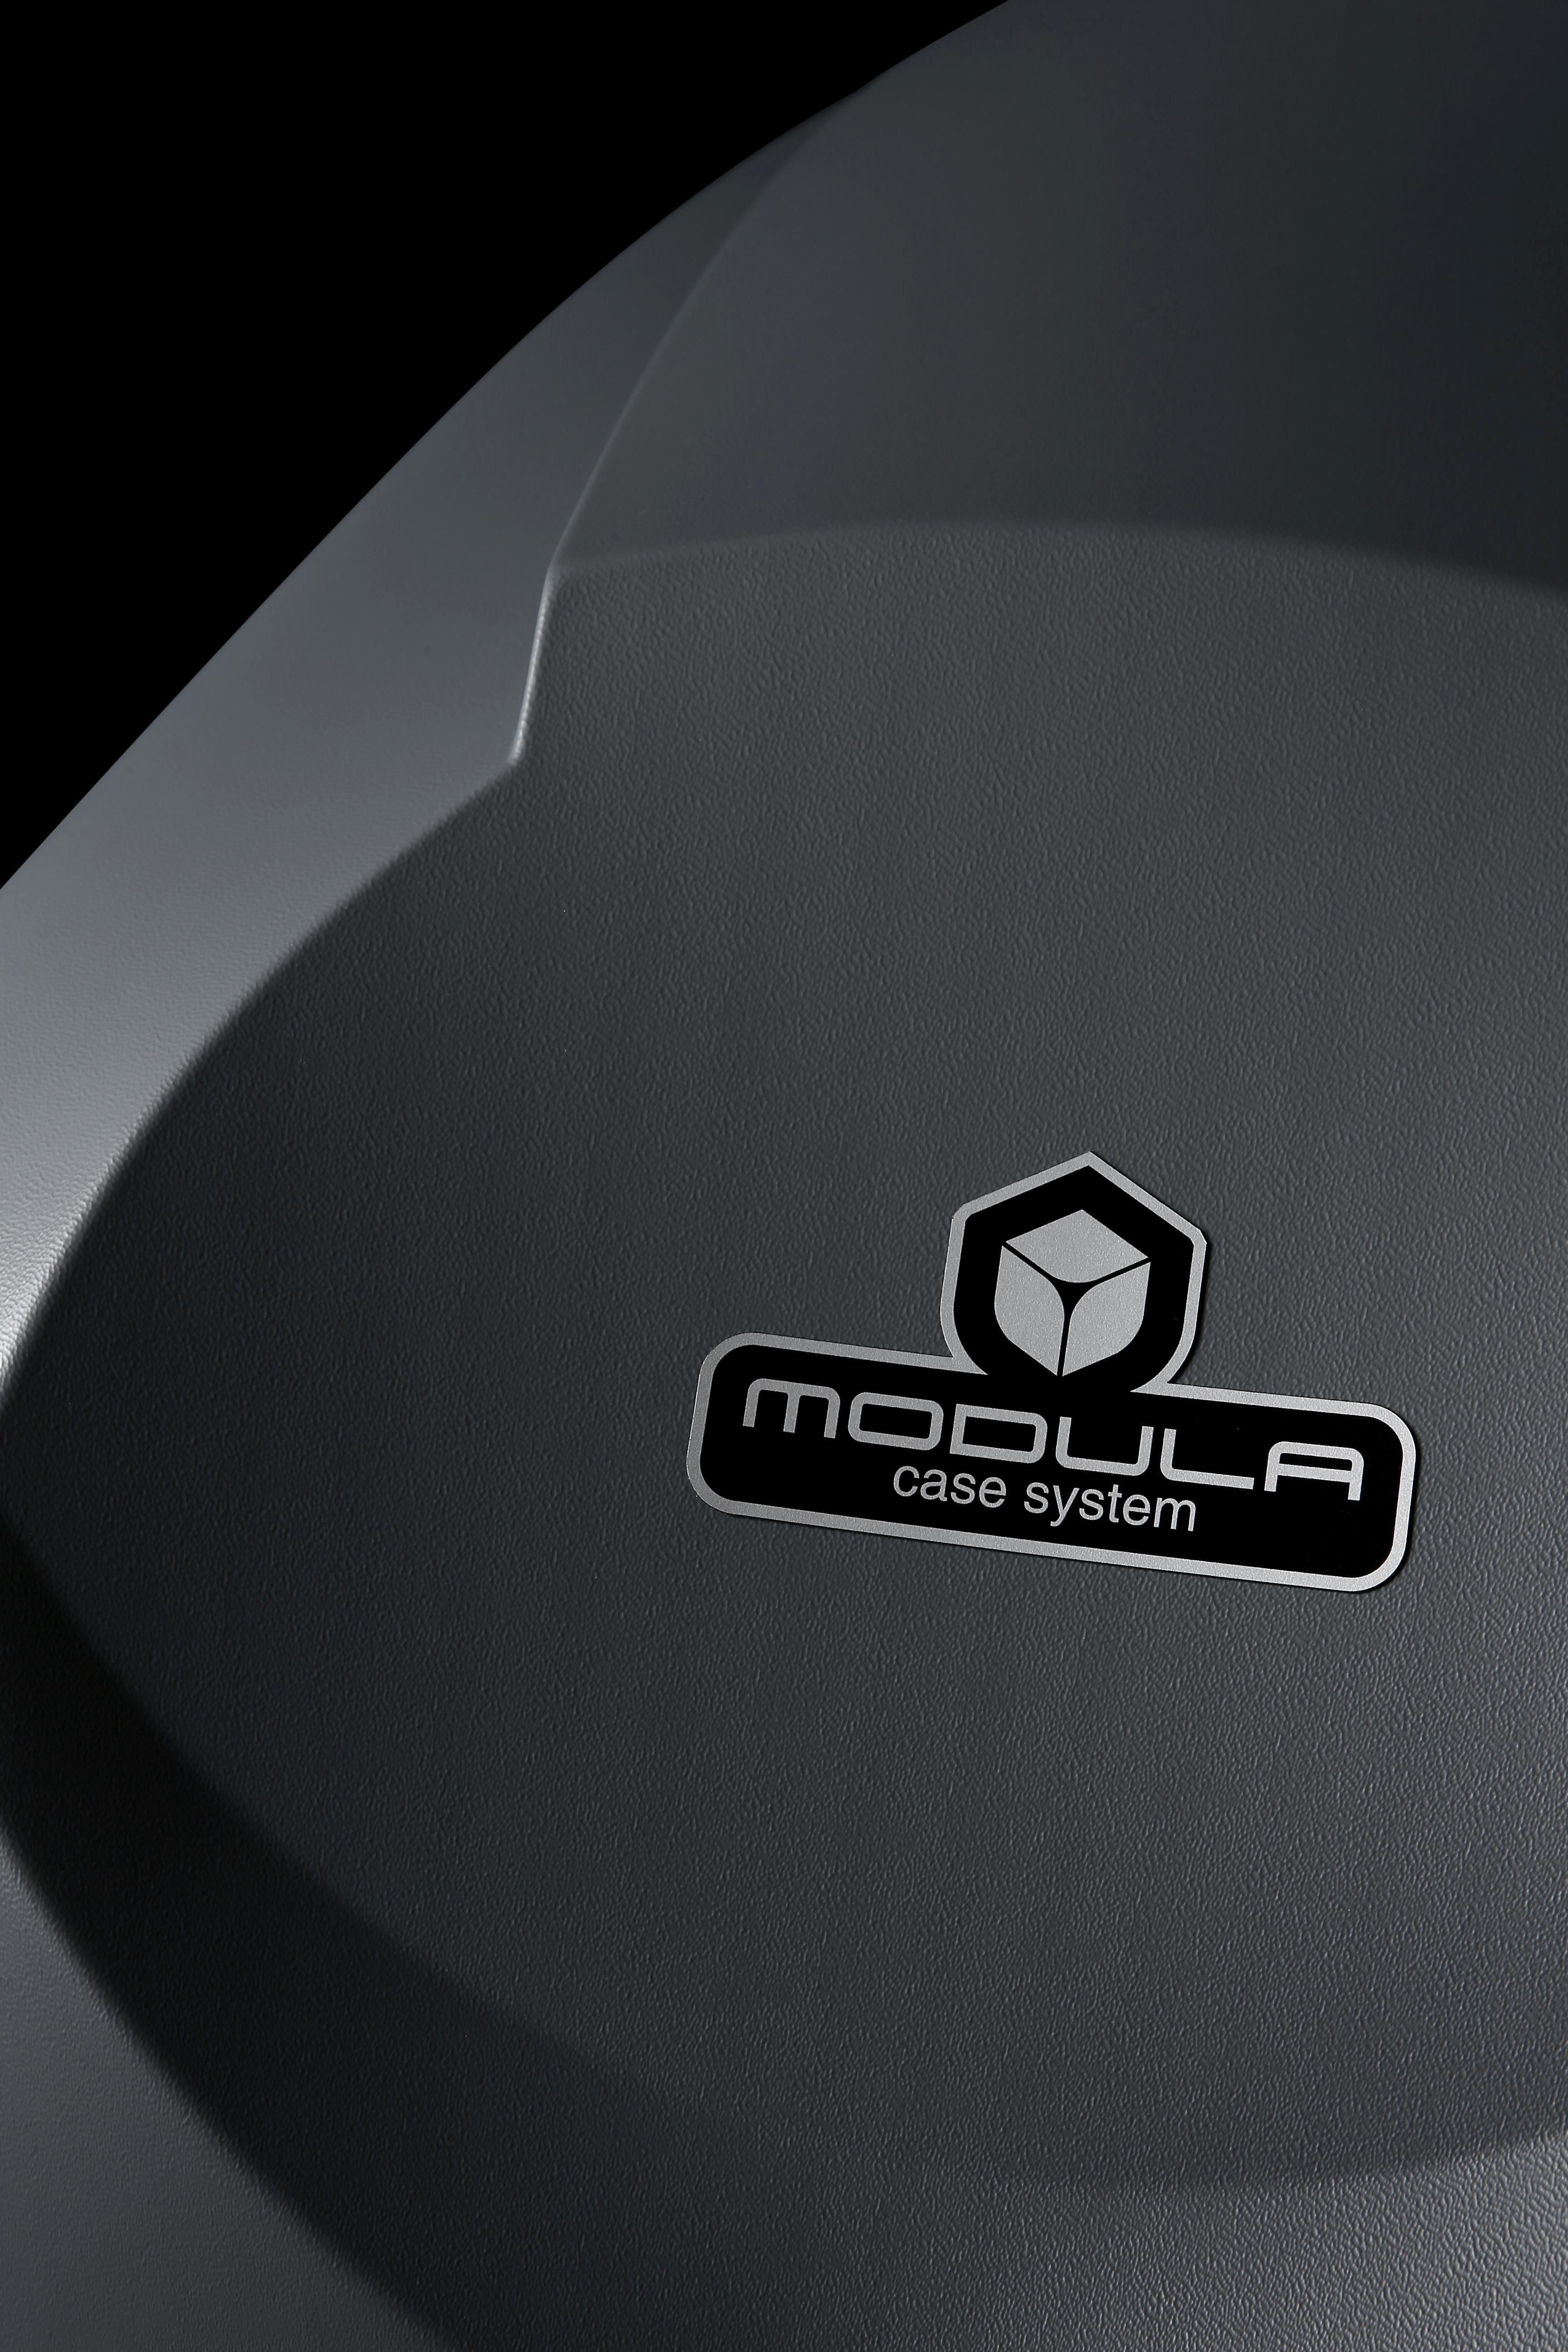 quality MOCS0327 MODULA